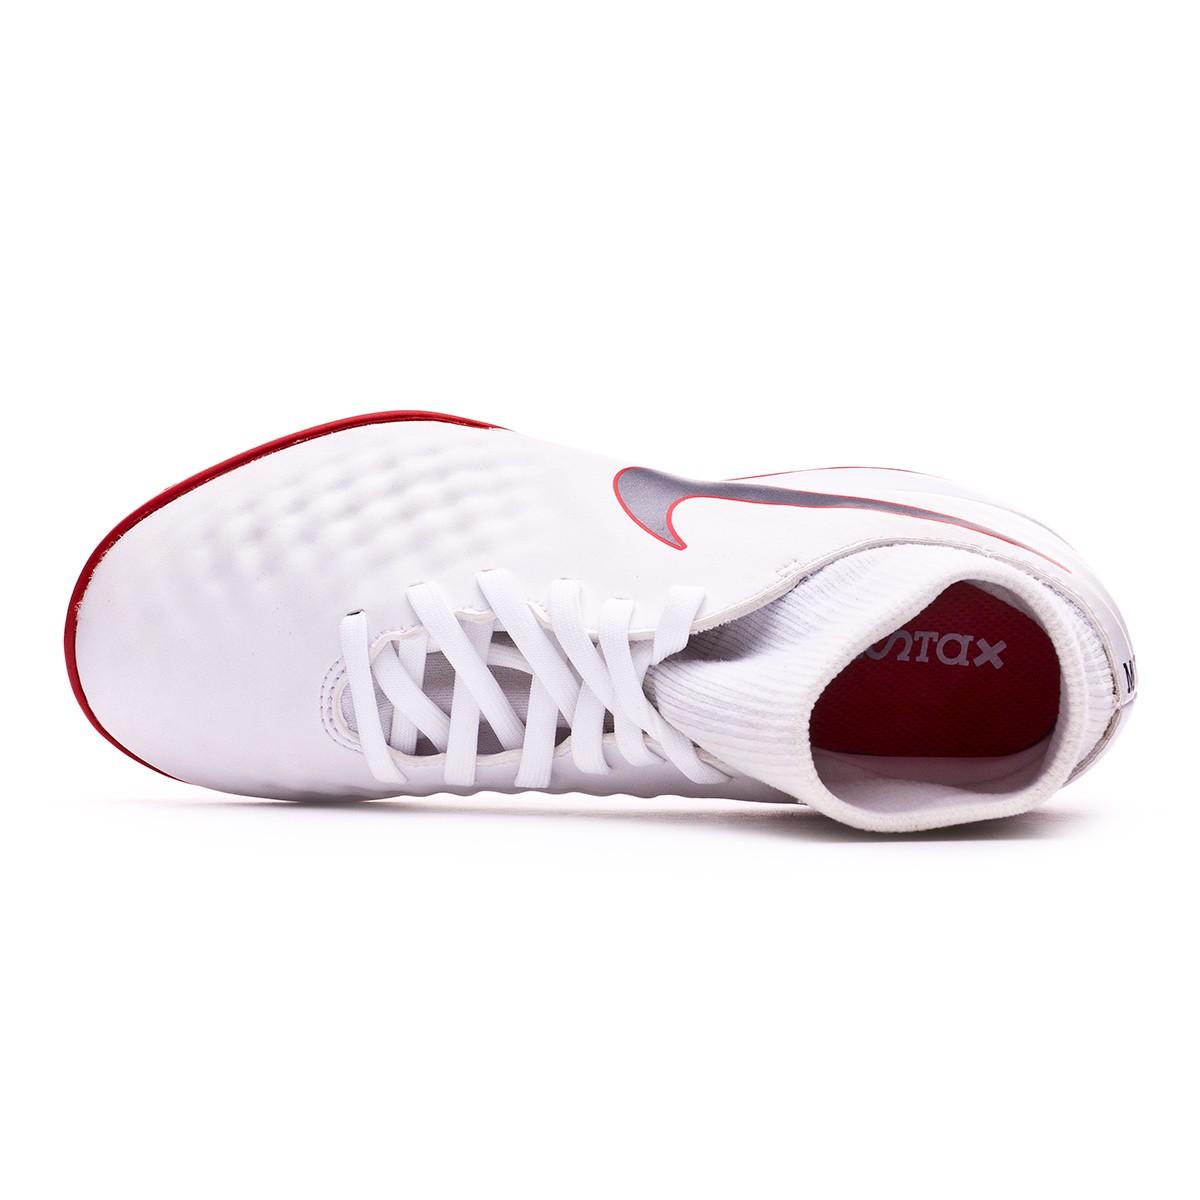 cce66fb7a41d Futsal Boot Nike Kids Magista ObraX II Academy DF IC White-Metallic cool  grey-Light crimson - Football store Fútbol Emotion